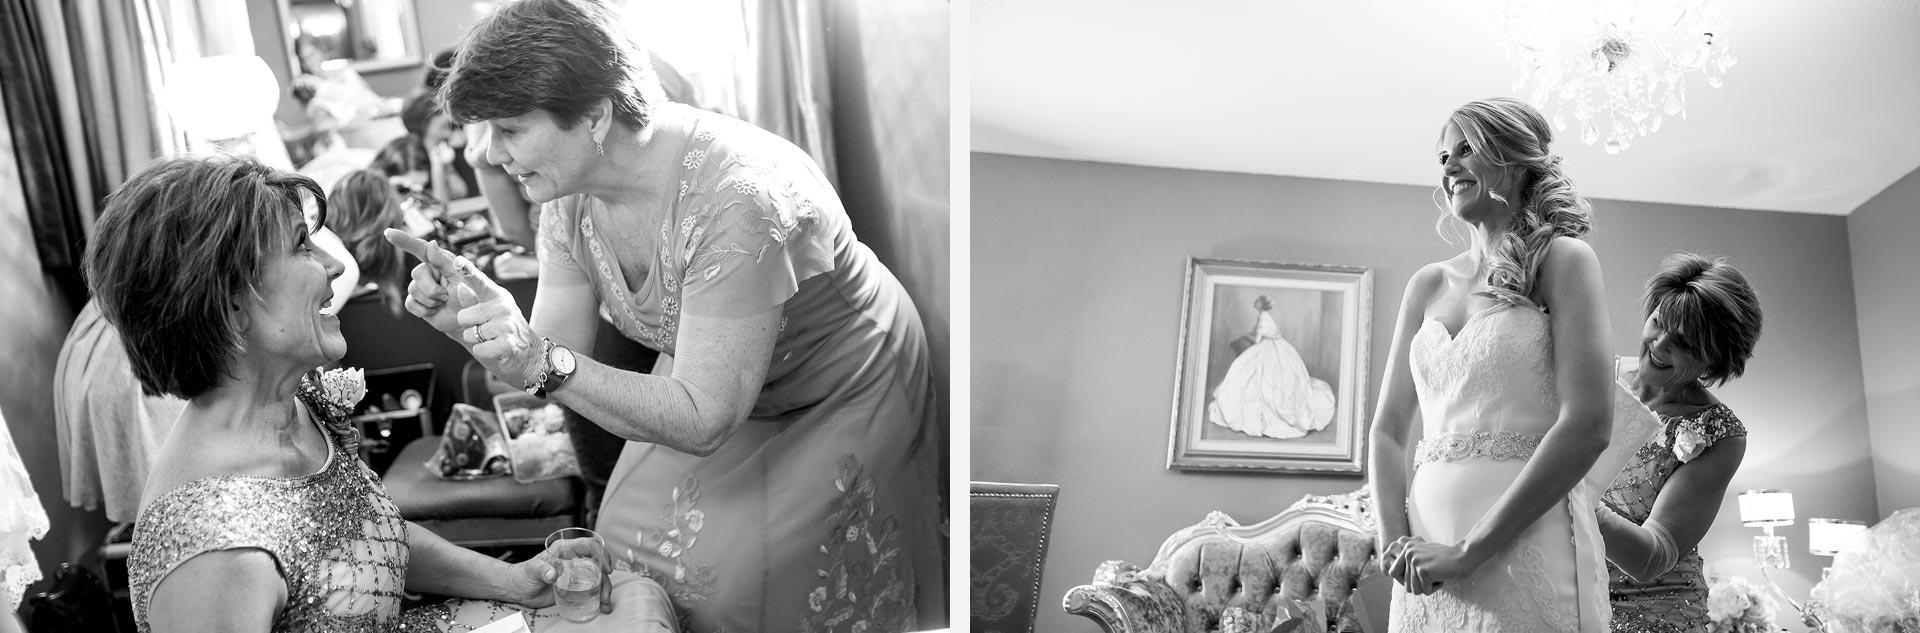 Wedding Photographers in Austin